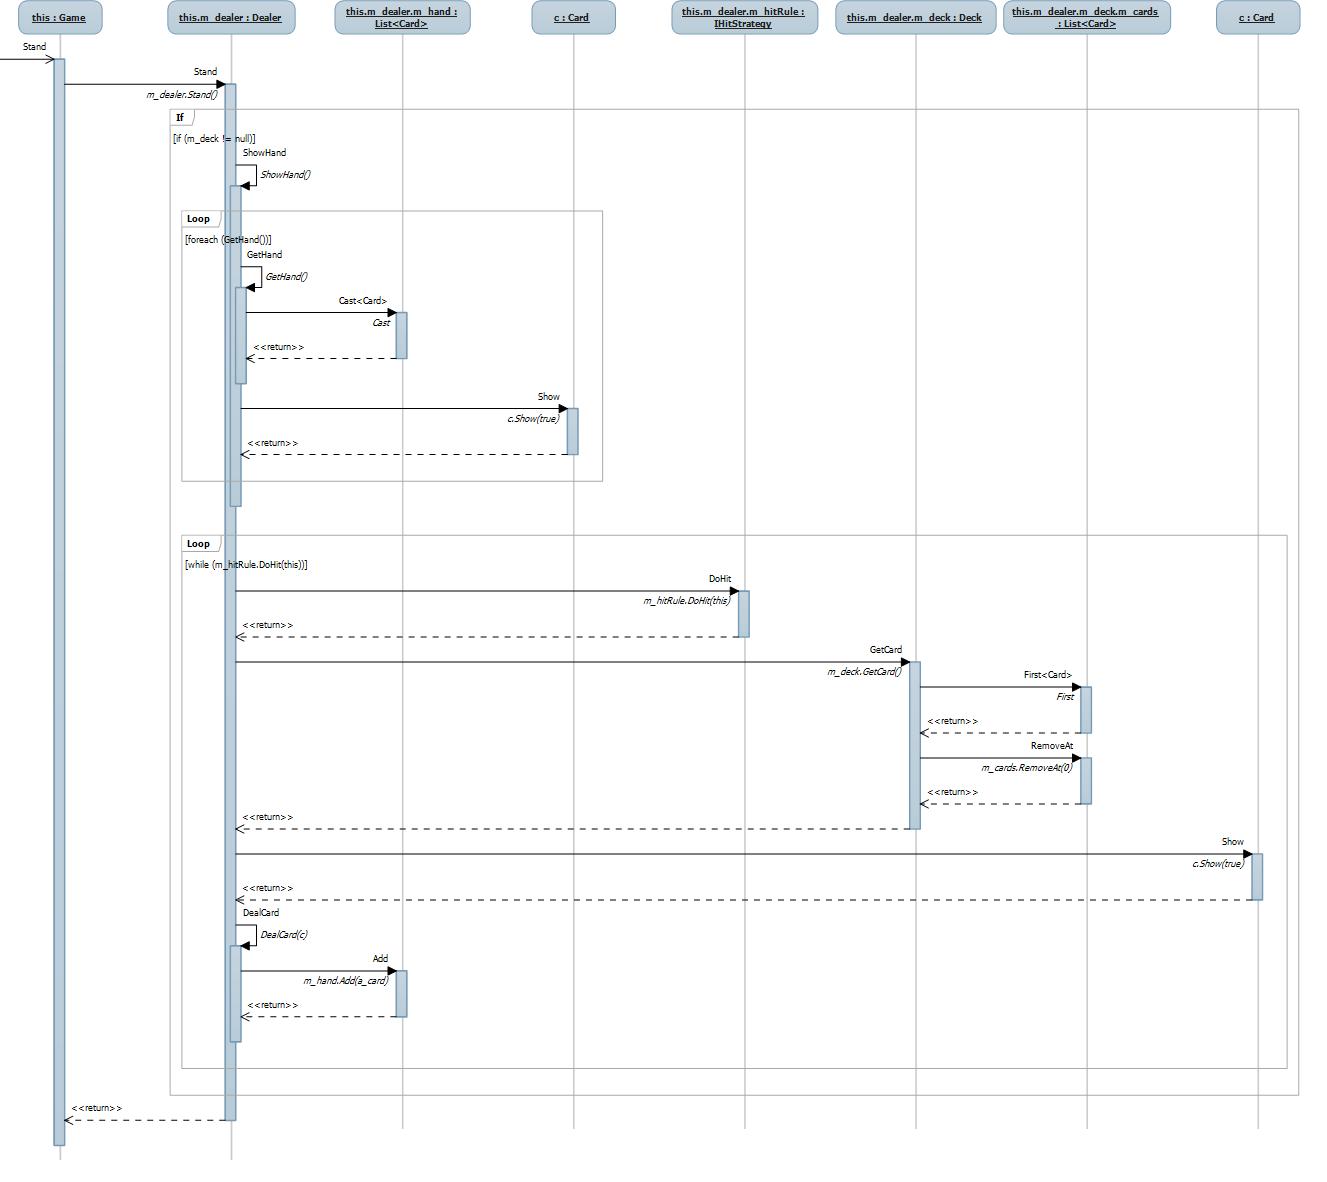 Workshop 3 design using patterns objektorienterad analys och blackjackstandsequencediagramg 2011 10 206762 kb ccuart Gallery